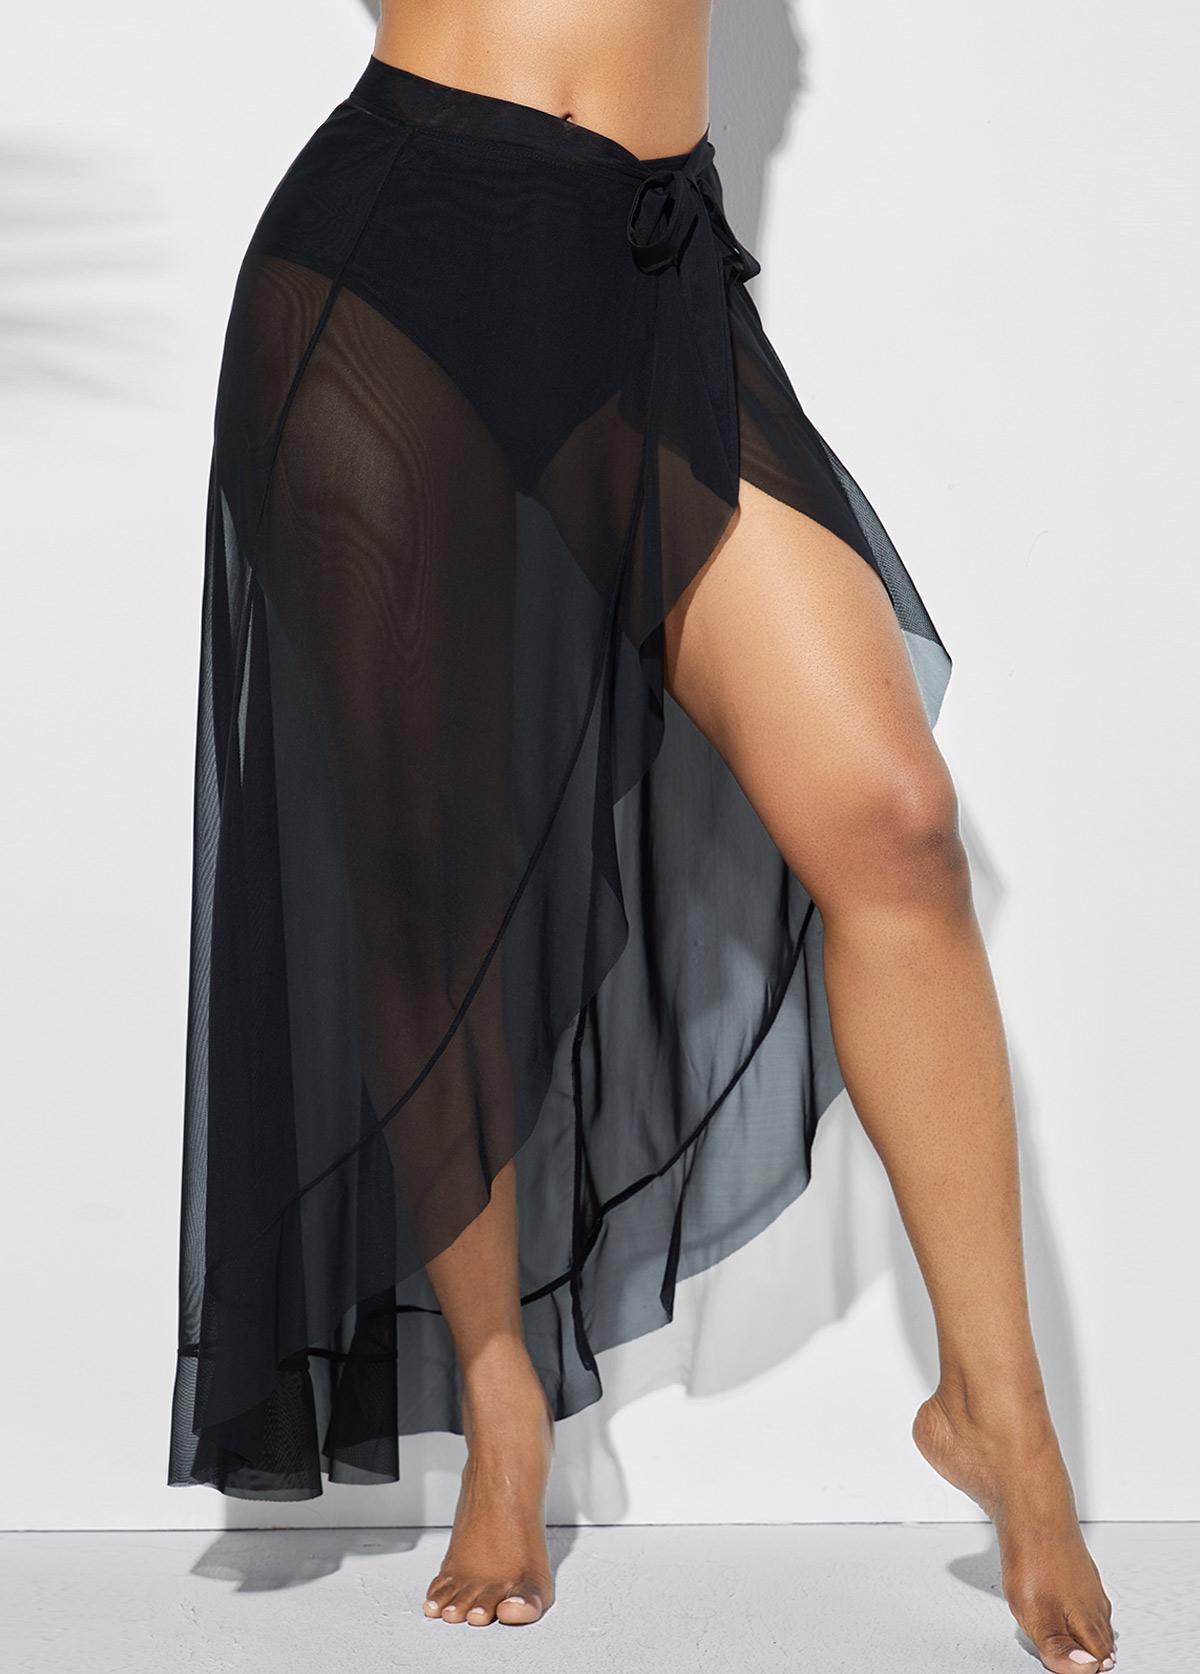 Black Side Slit Asymmetric Hem One Piece Beach Skirt